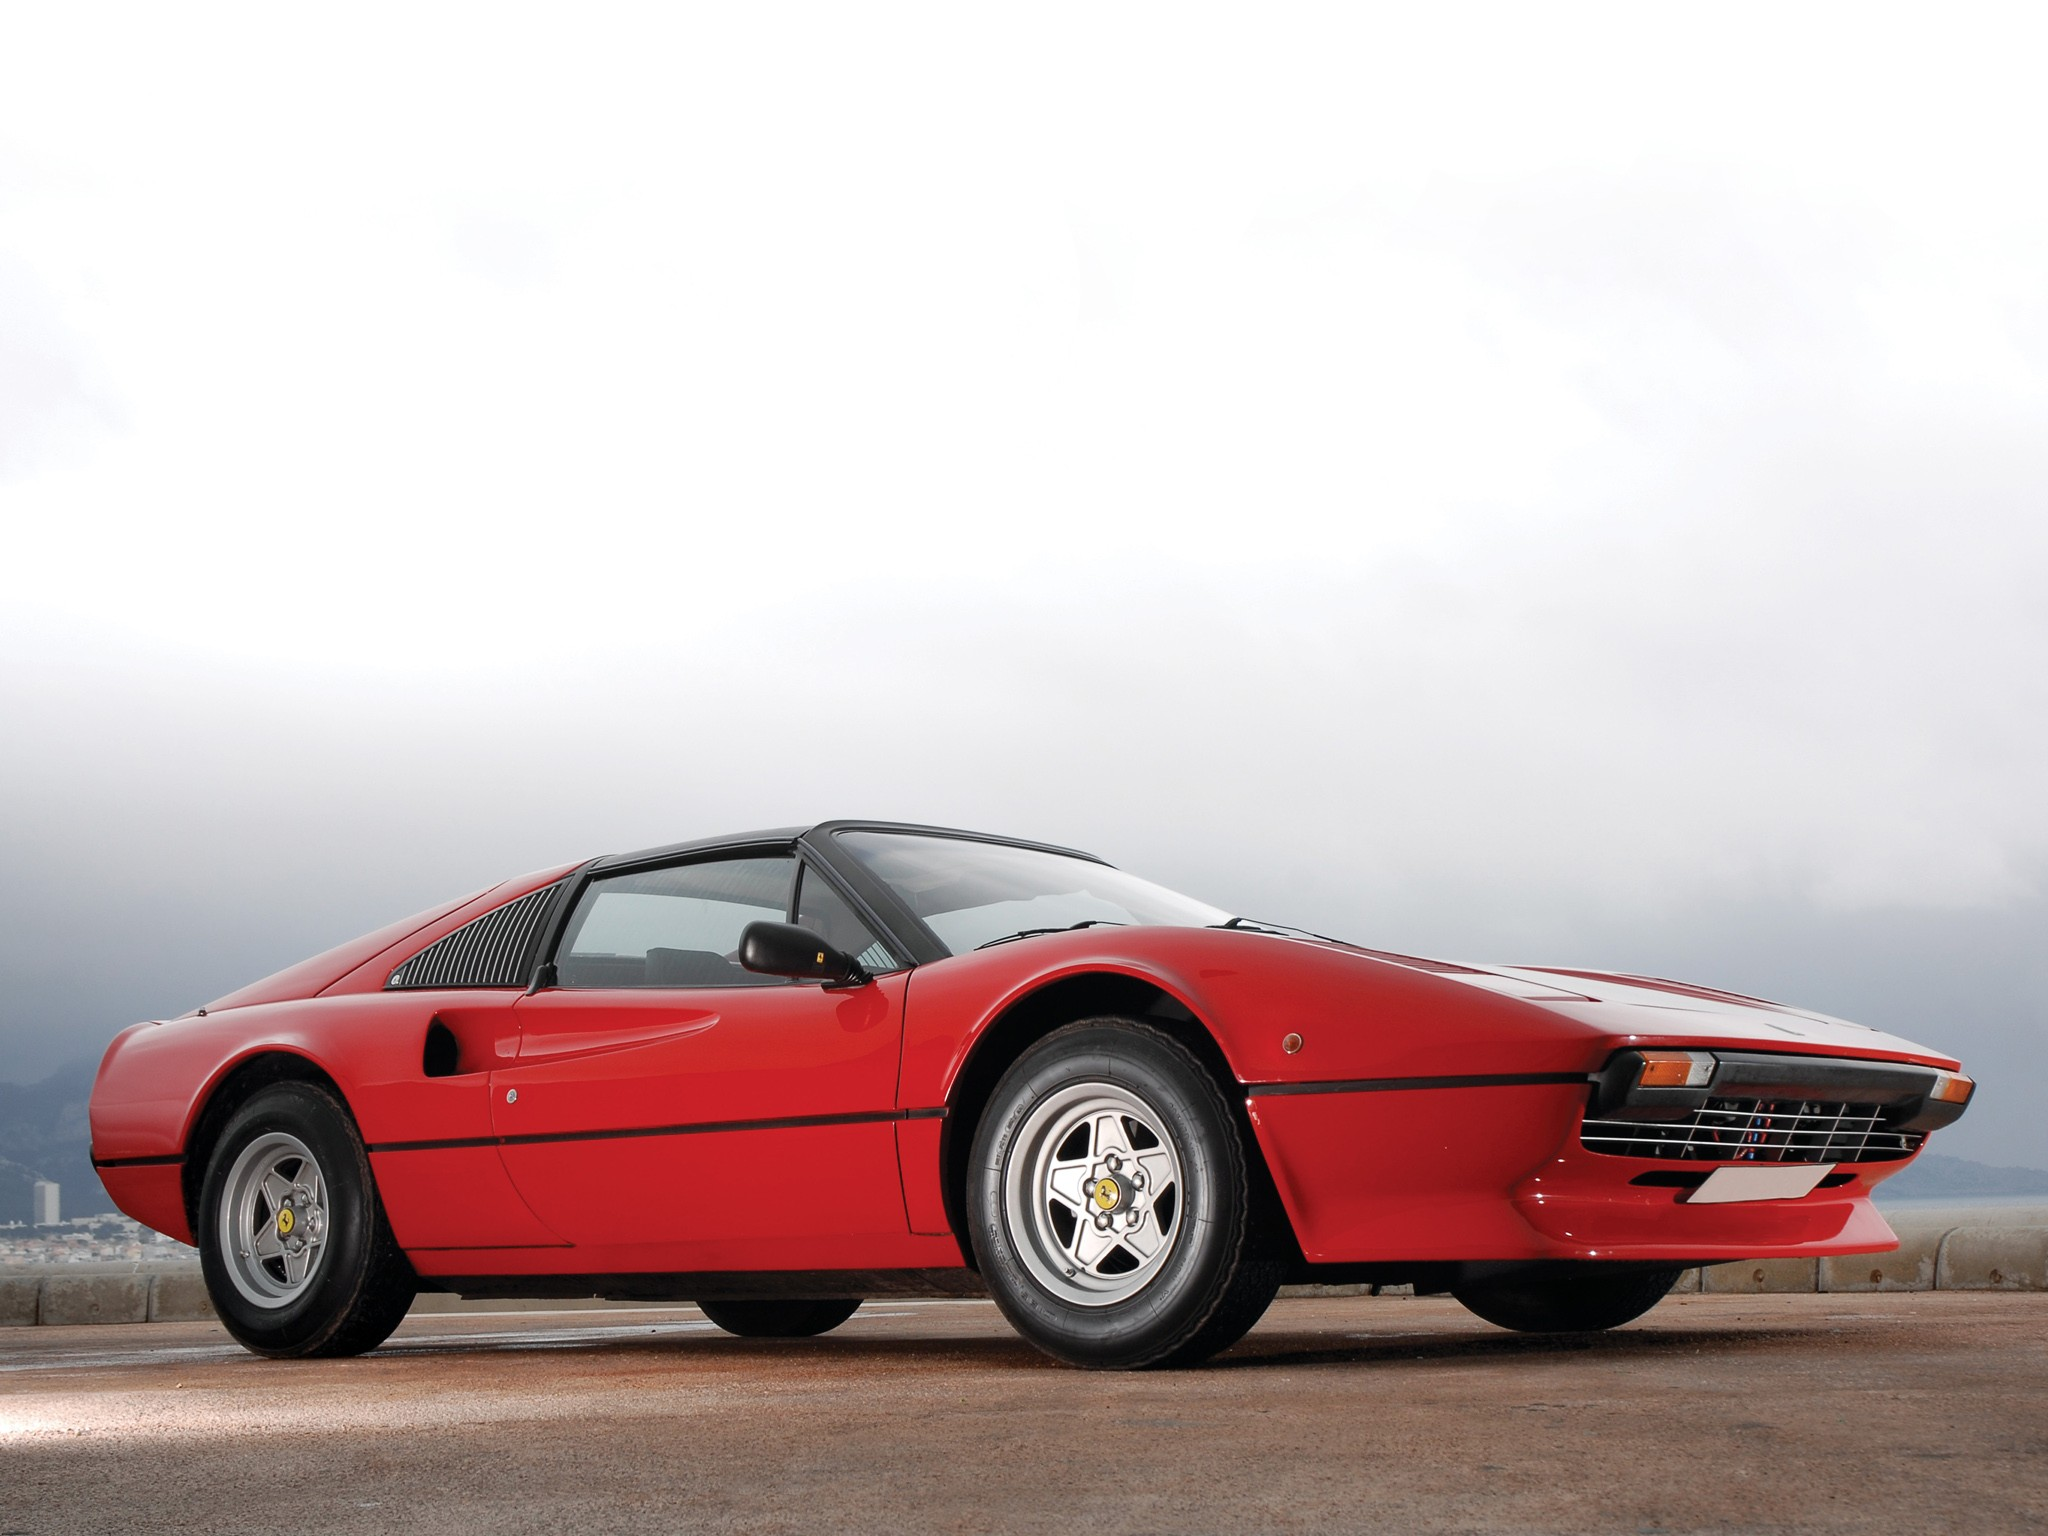 Ferrari 308 Gts Specs 1977 1978 1979 1980 Autoevolution